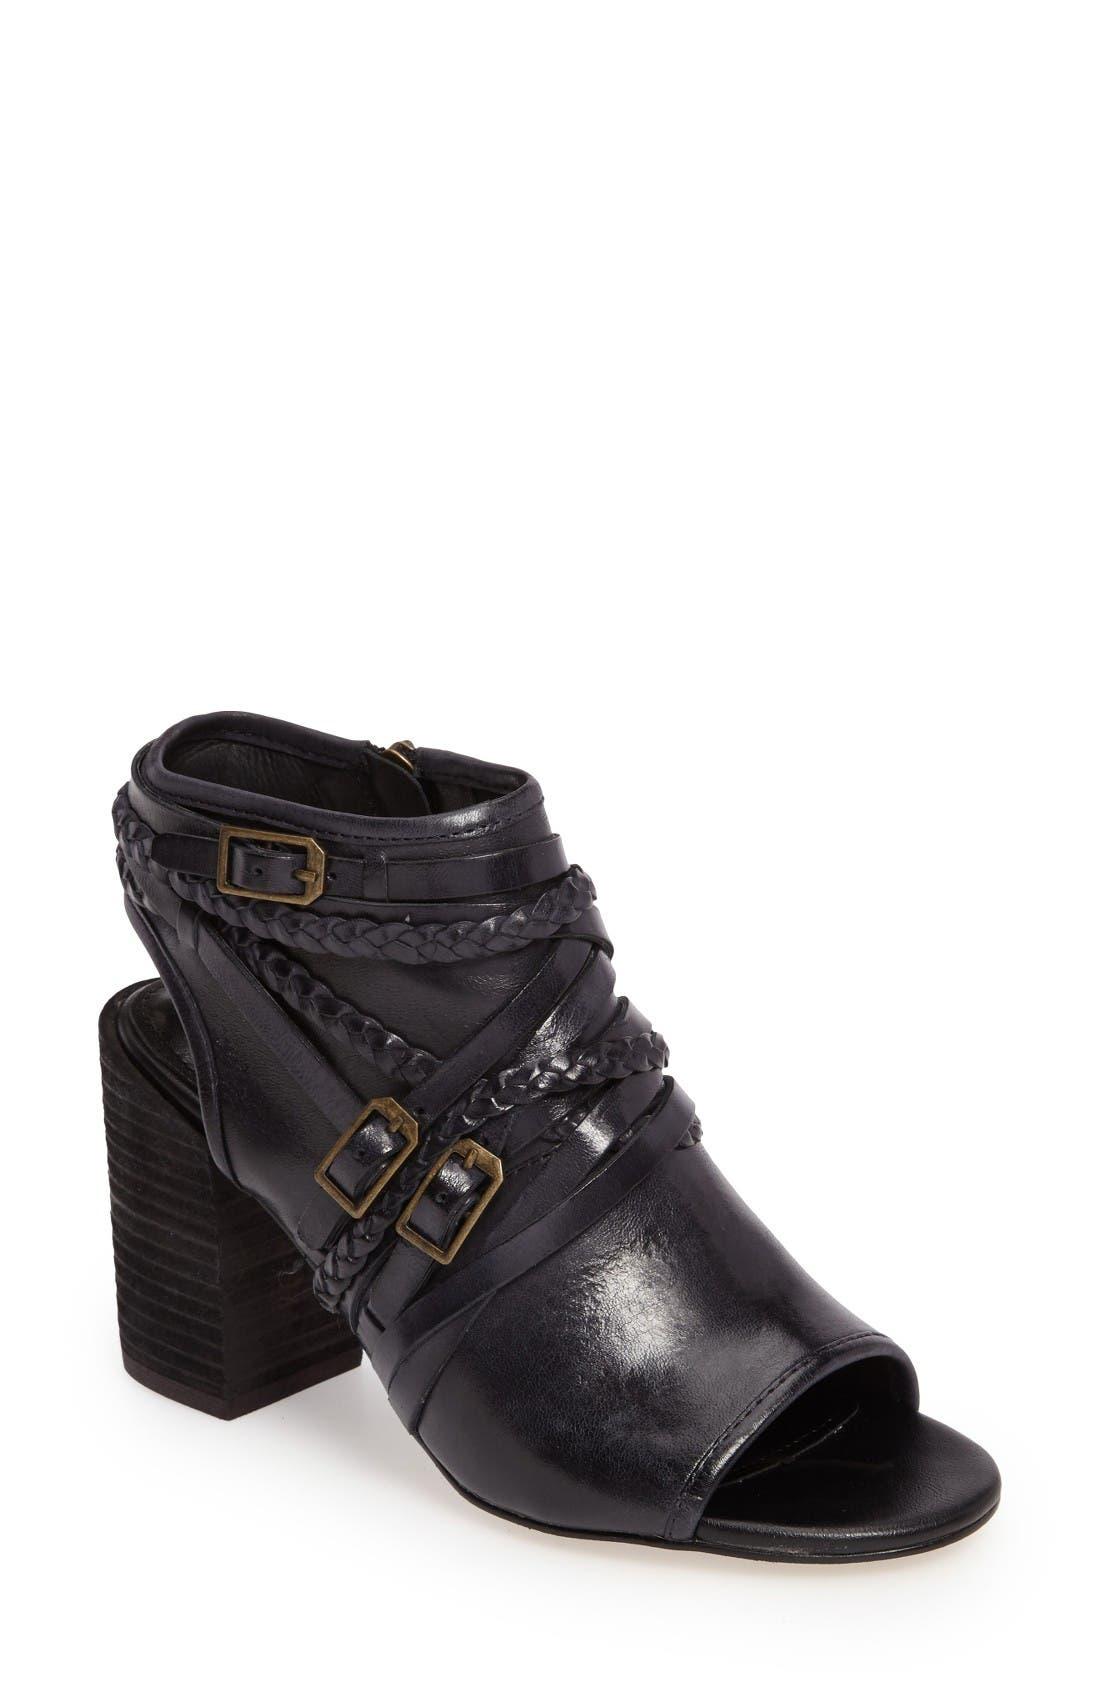 Alternate Image 1 Selected - Isolá Leonora Strappy Block Heel Sandal (Women)